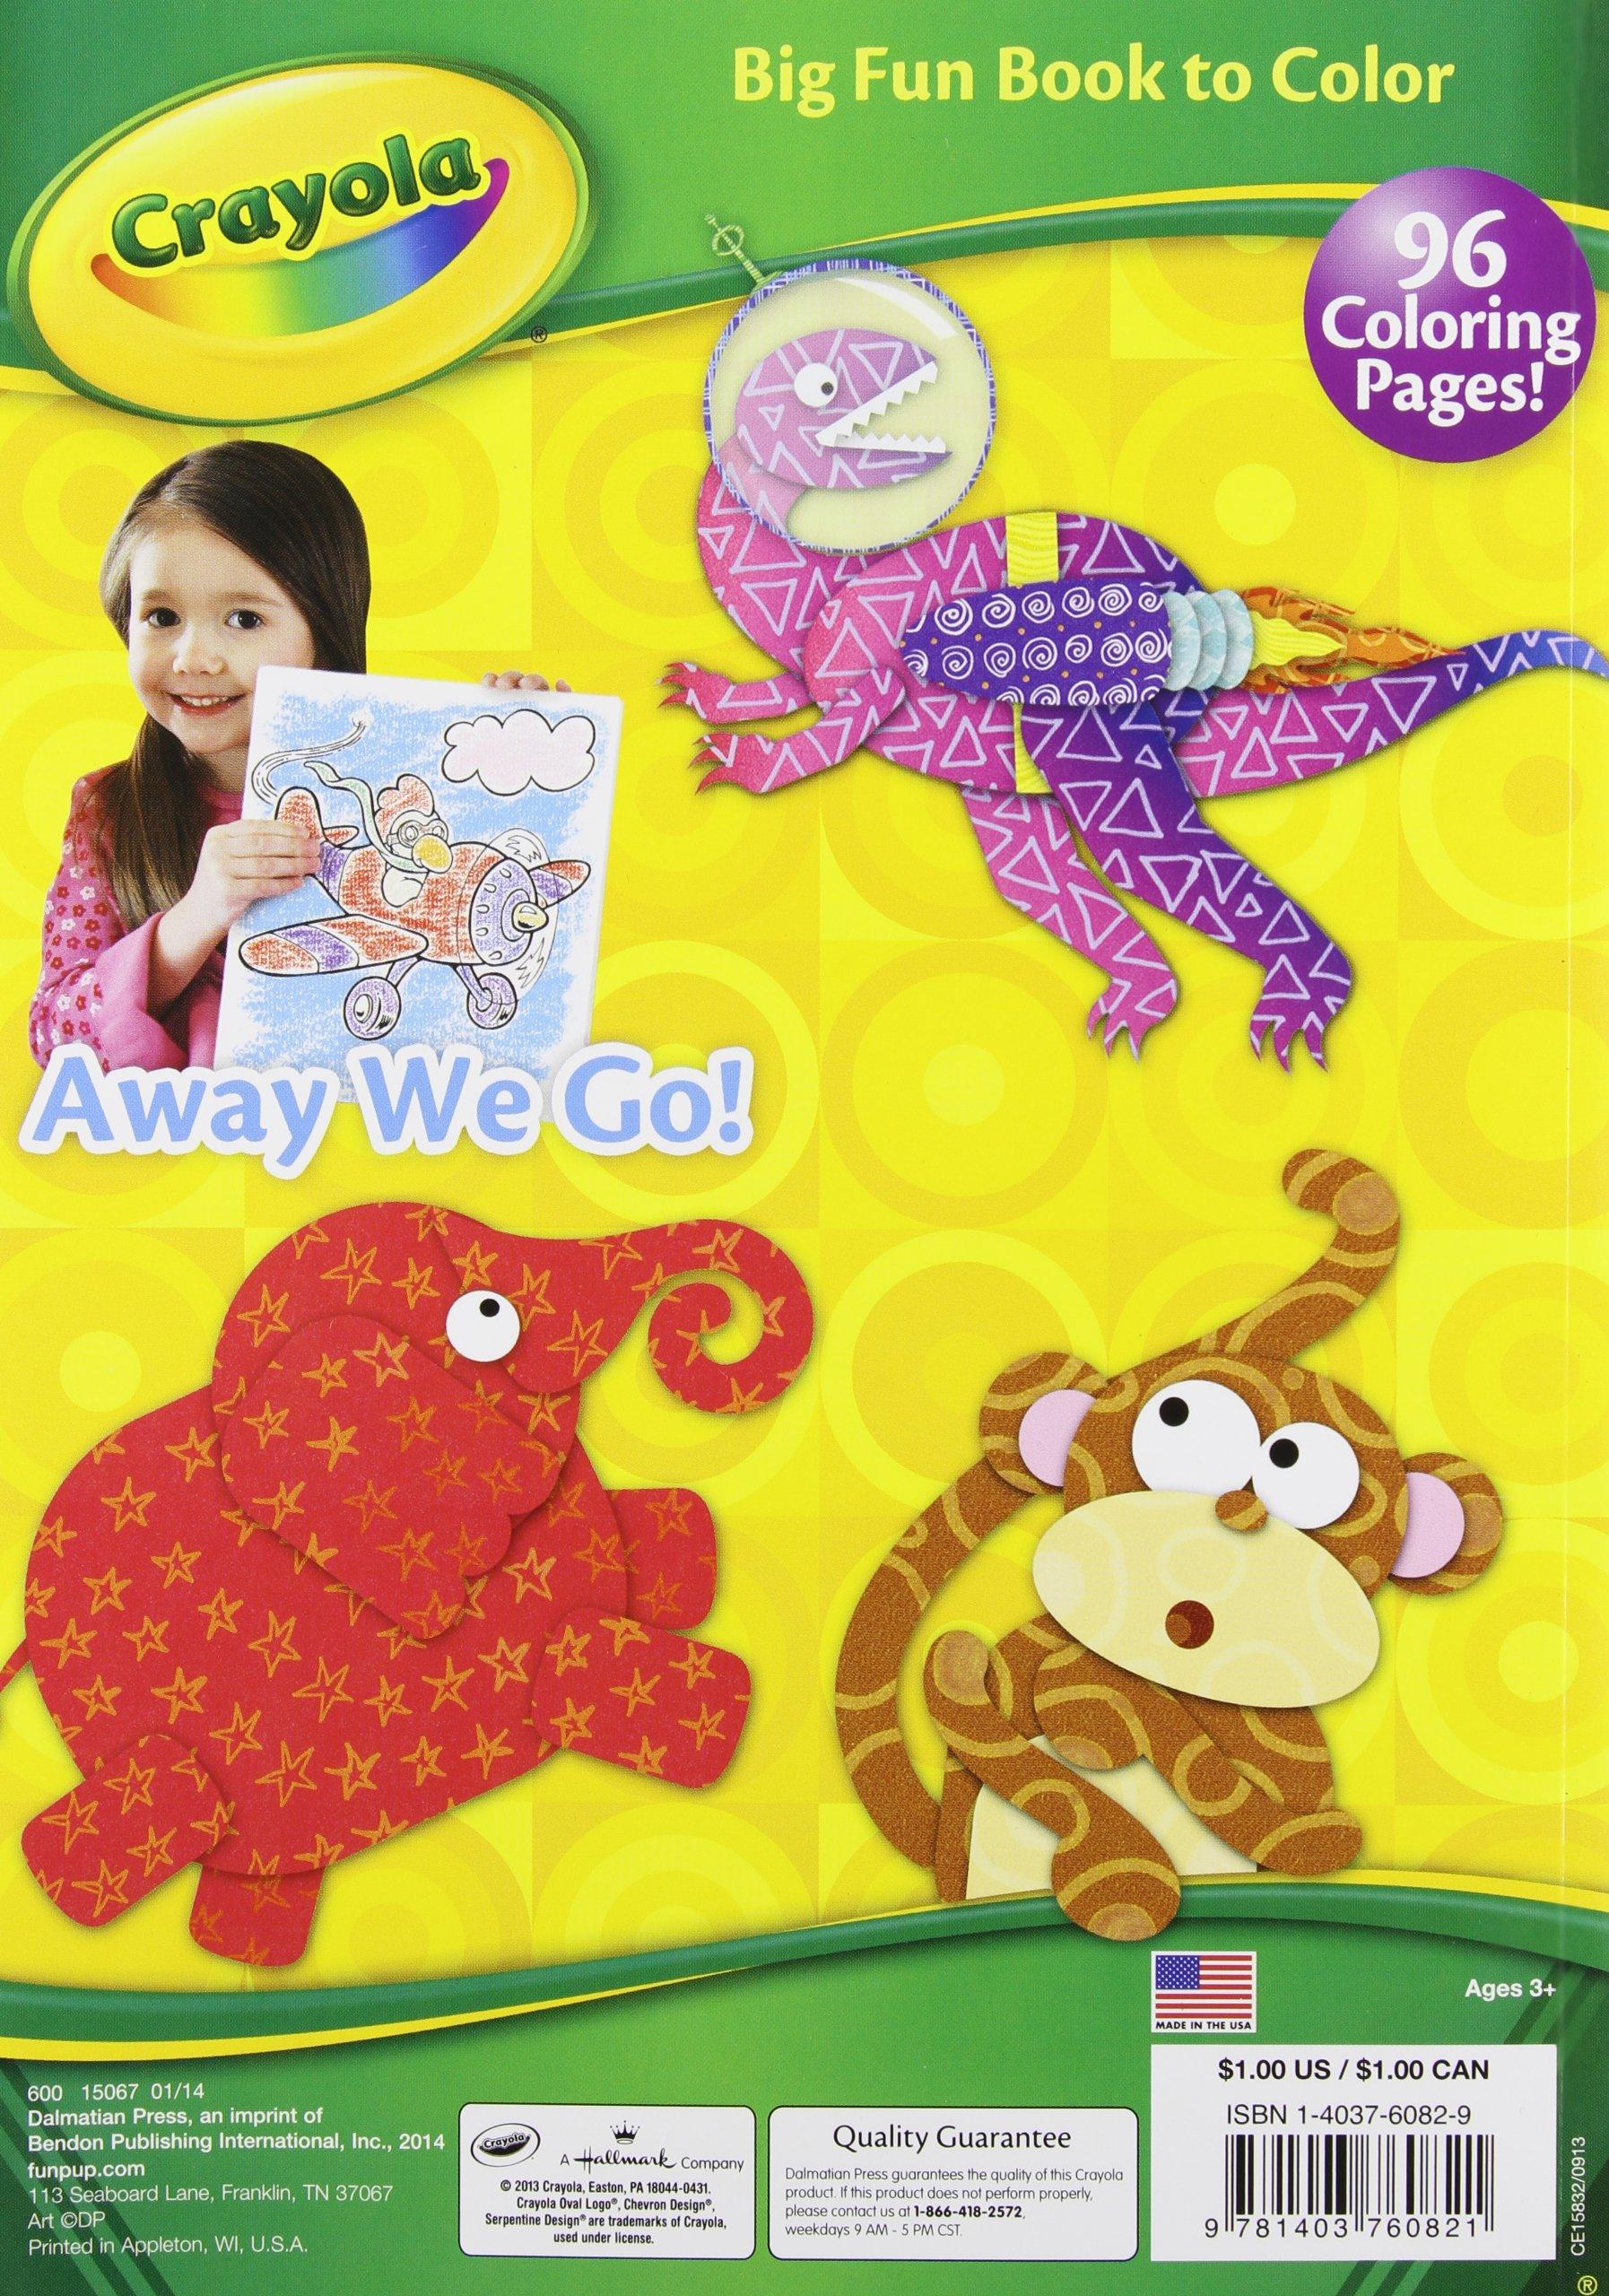 Fantastic fun book to color - Crayola Big Fun Book To Color Assortment Dalmatian Publishing 9781403760821 Books Amazon Ca